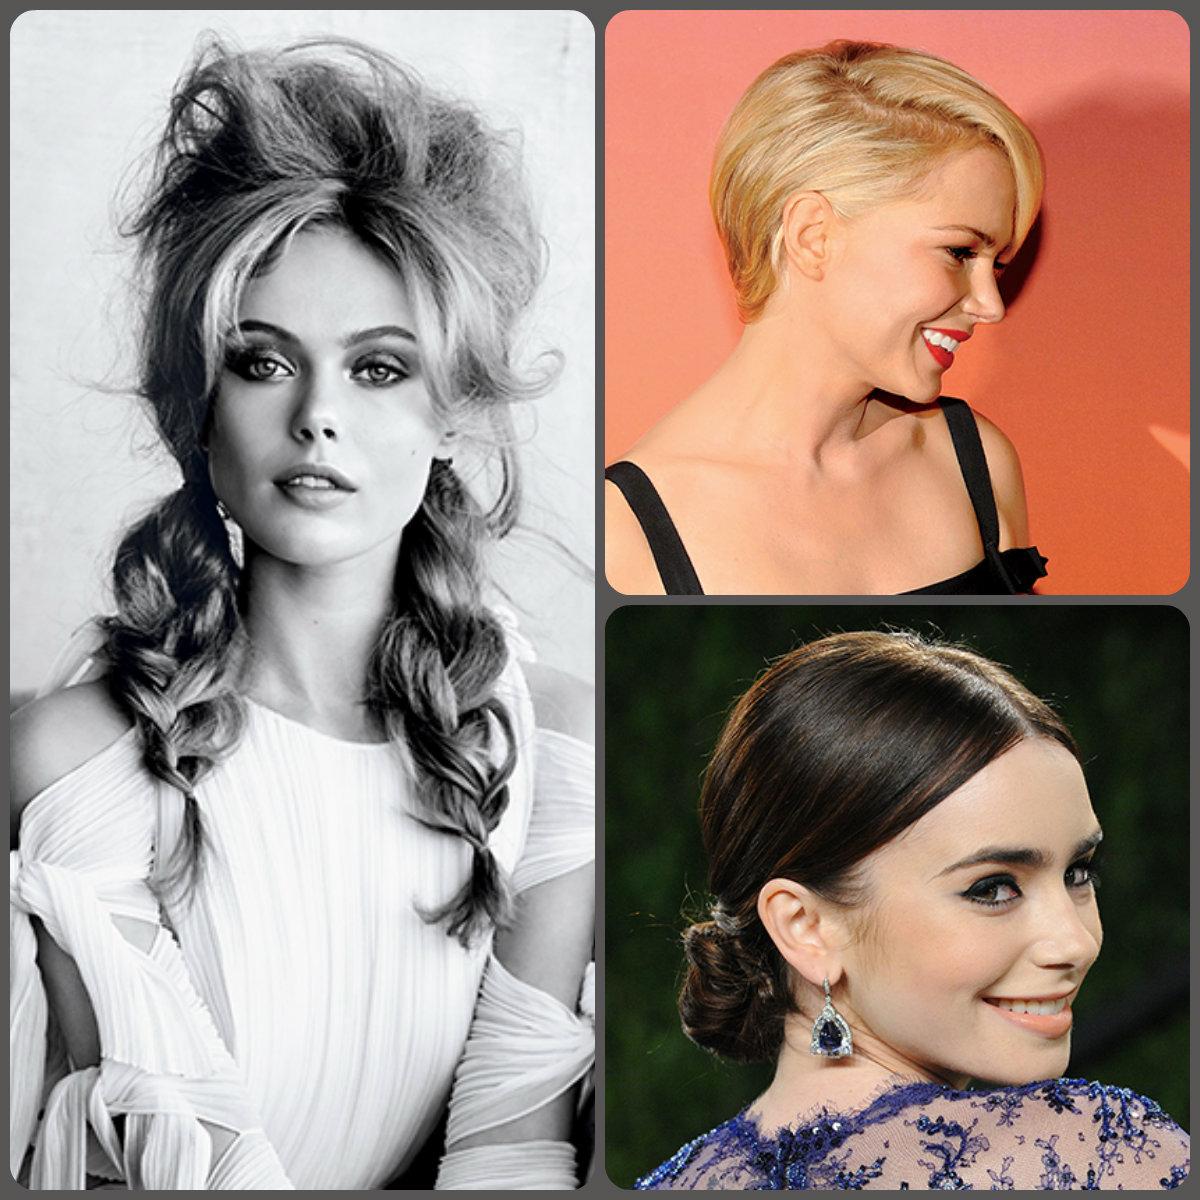 brand new hairstyles 2015